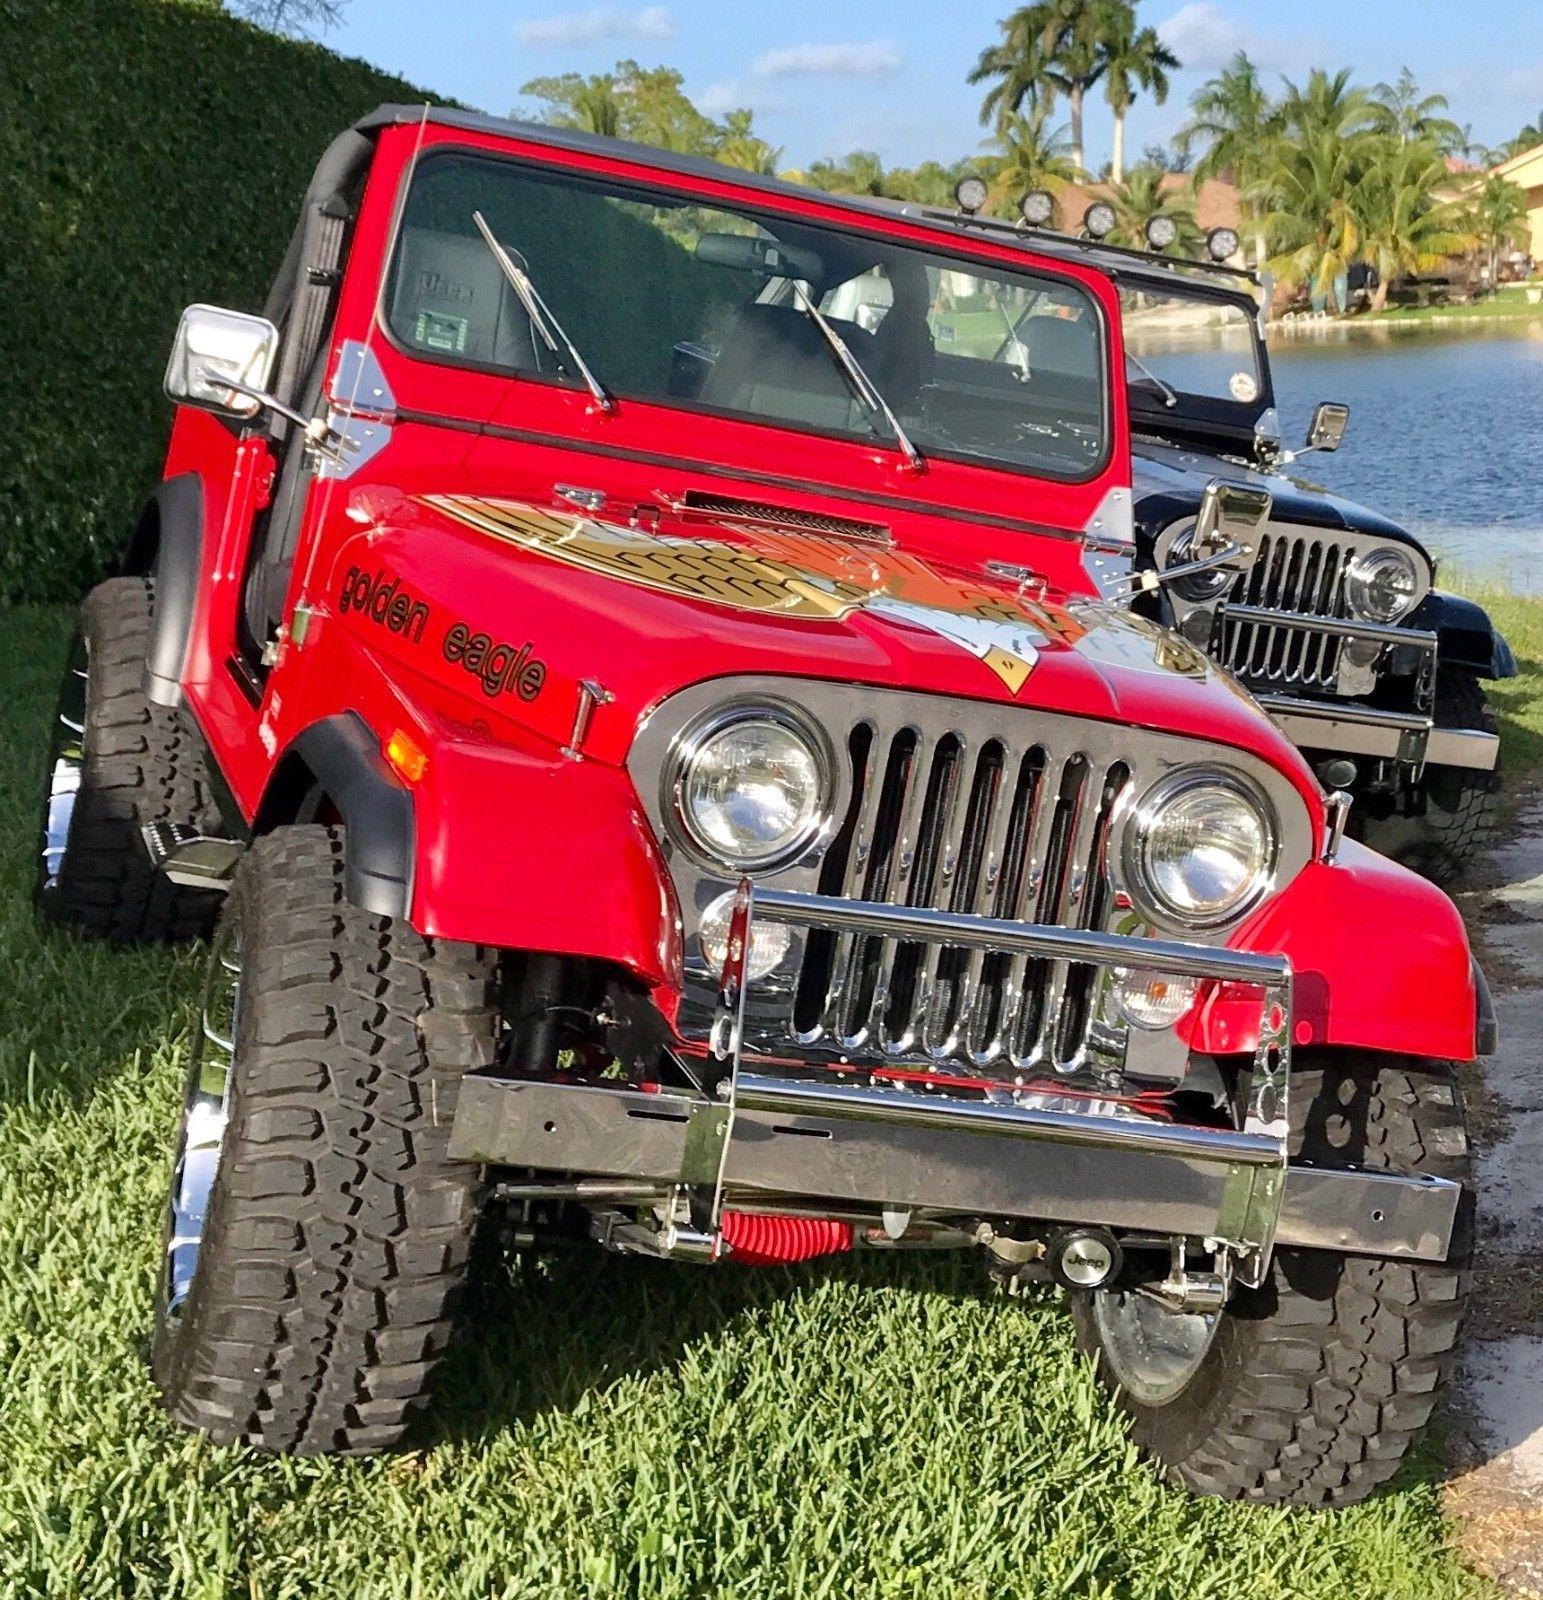 Ebay 1978 Jeep Cj Cj7 1978 Jeep Cj7 Golden Eagle Jeep Jeeplife